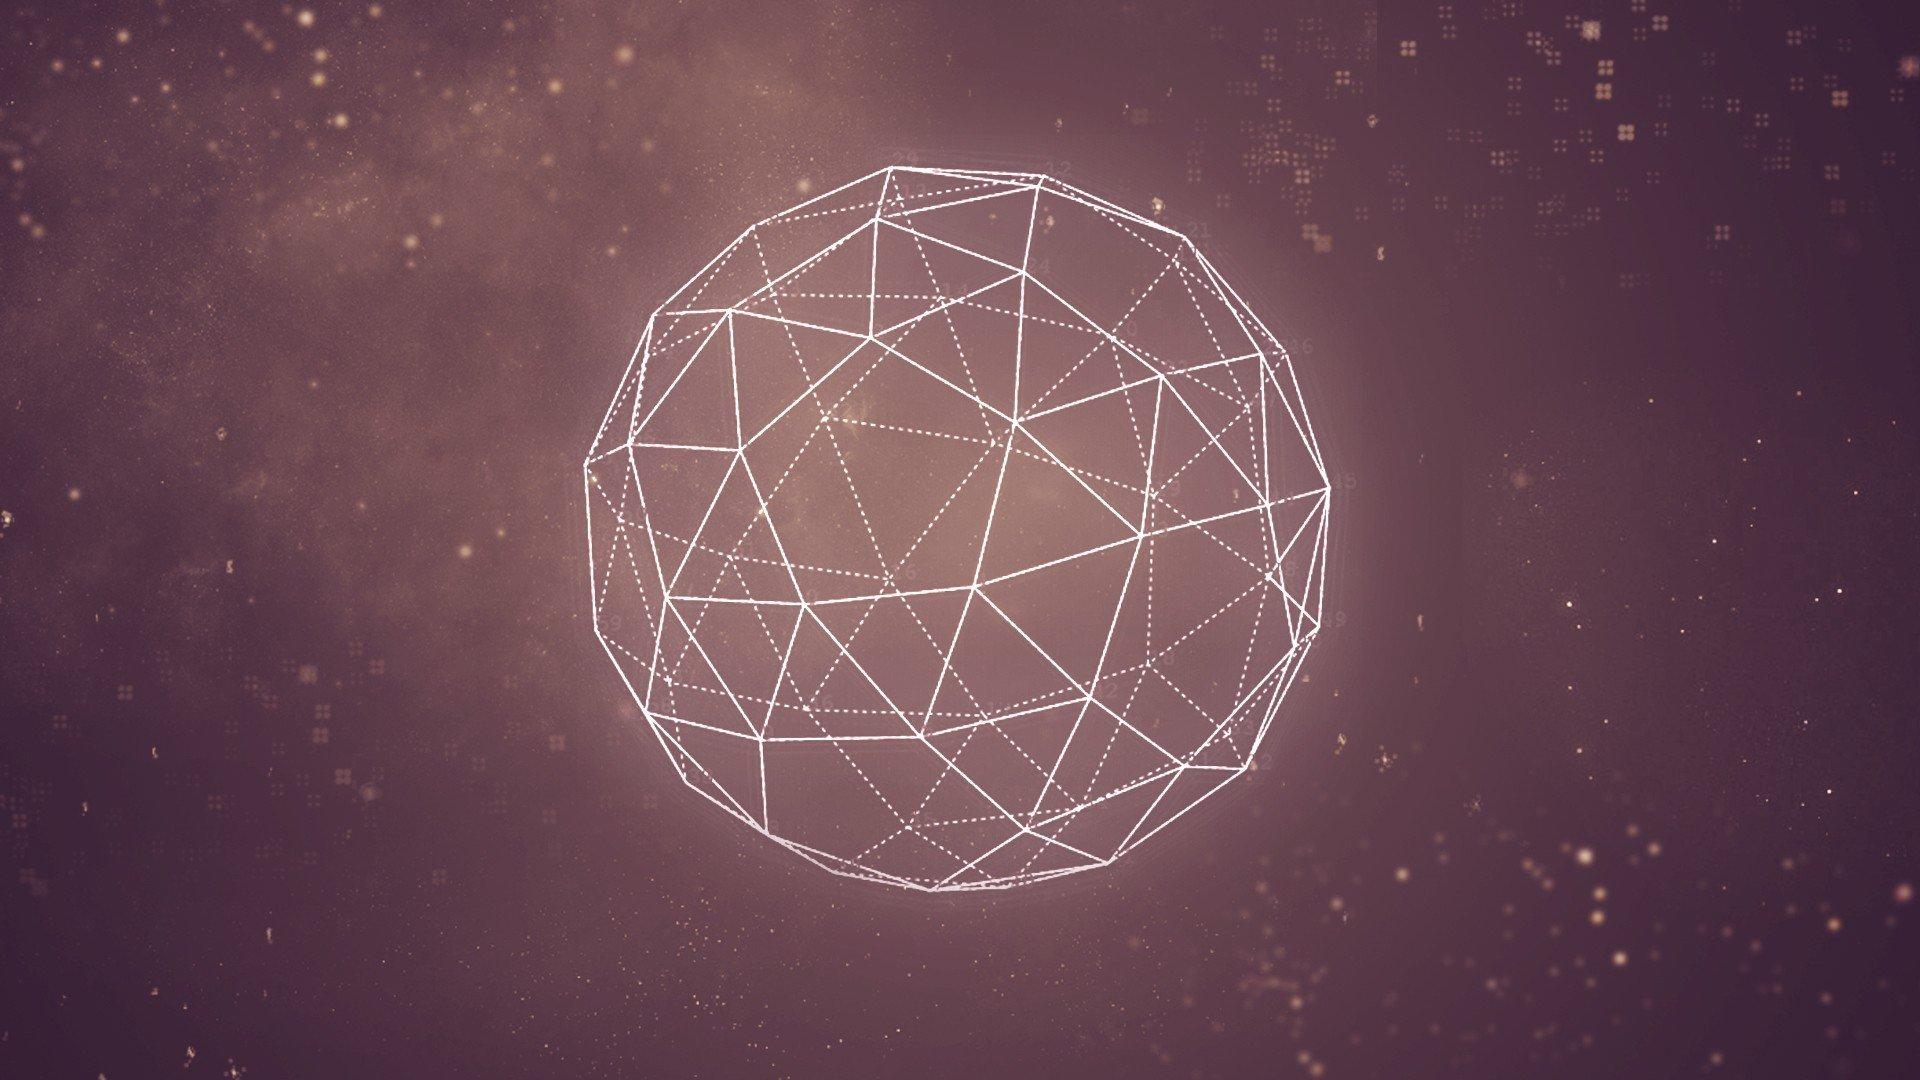 Simple Wallpaper Mac Geometric - 3NxcLn  Image_984832.jpg